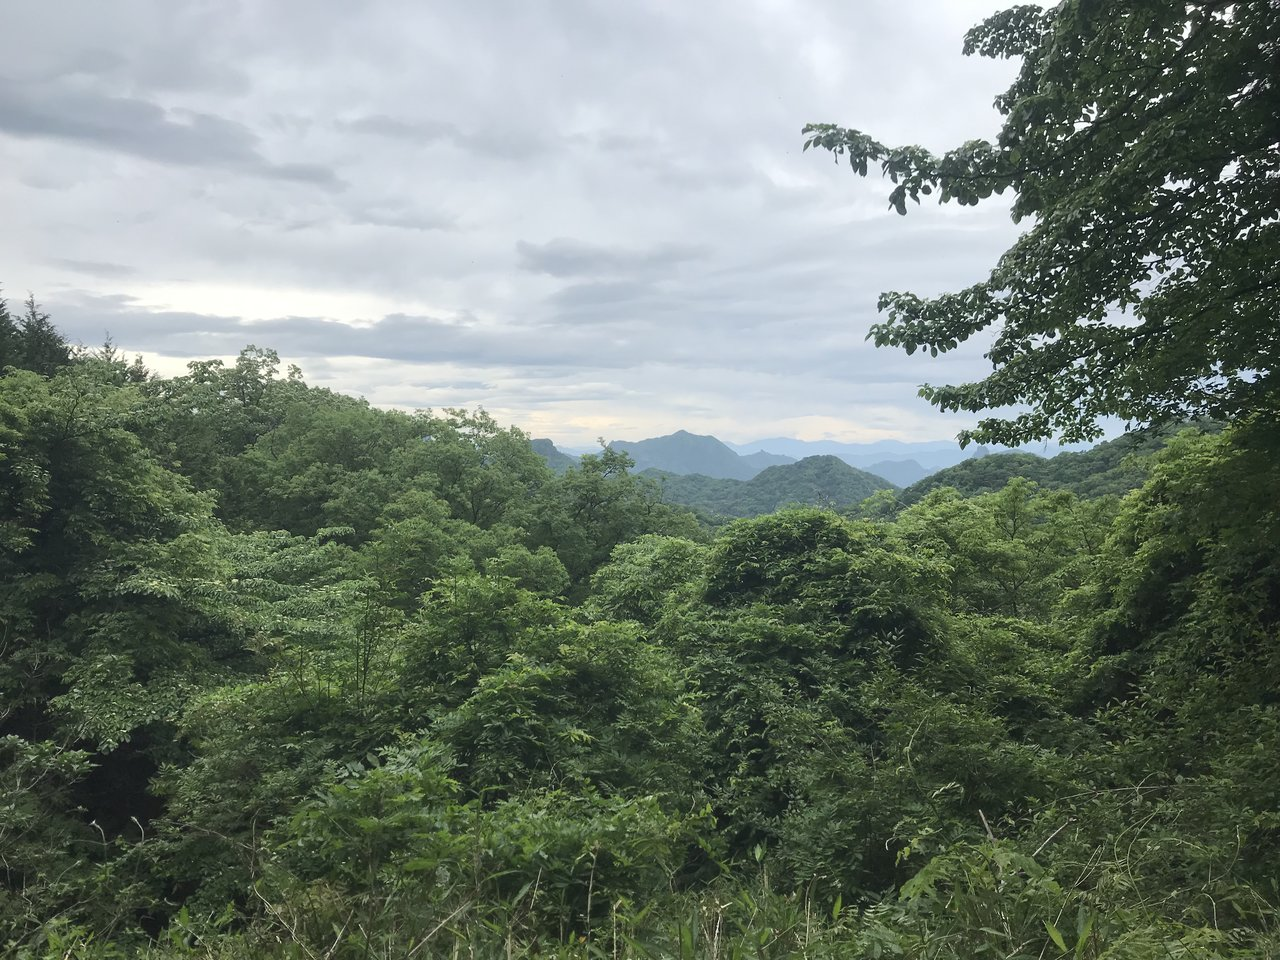 Forest near Yokokawa | Photo taken by Pui san C